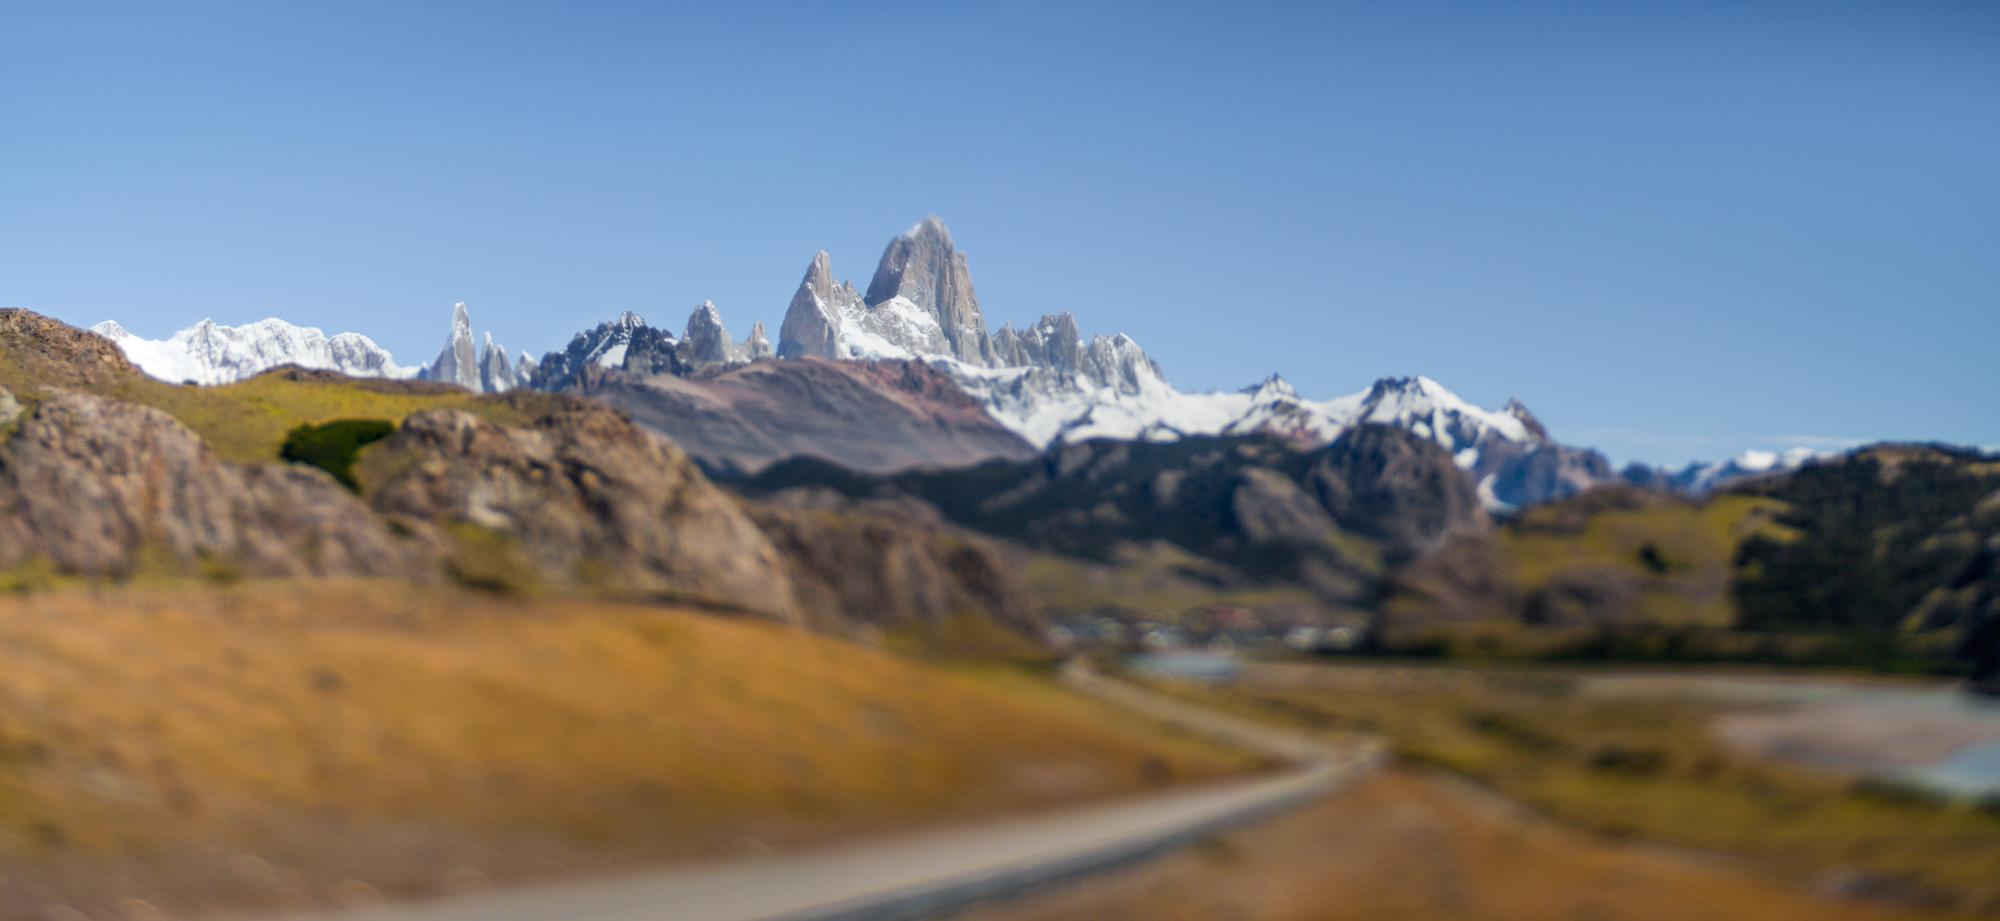 The Patagonia, Argentina